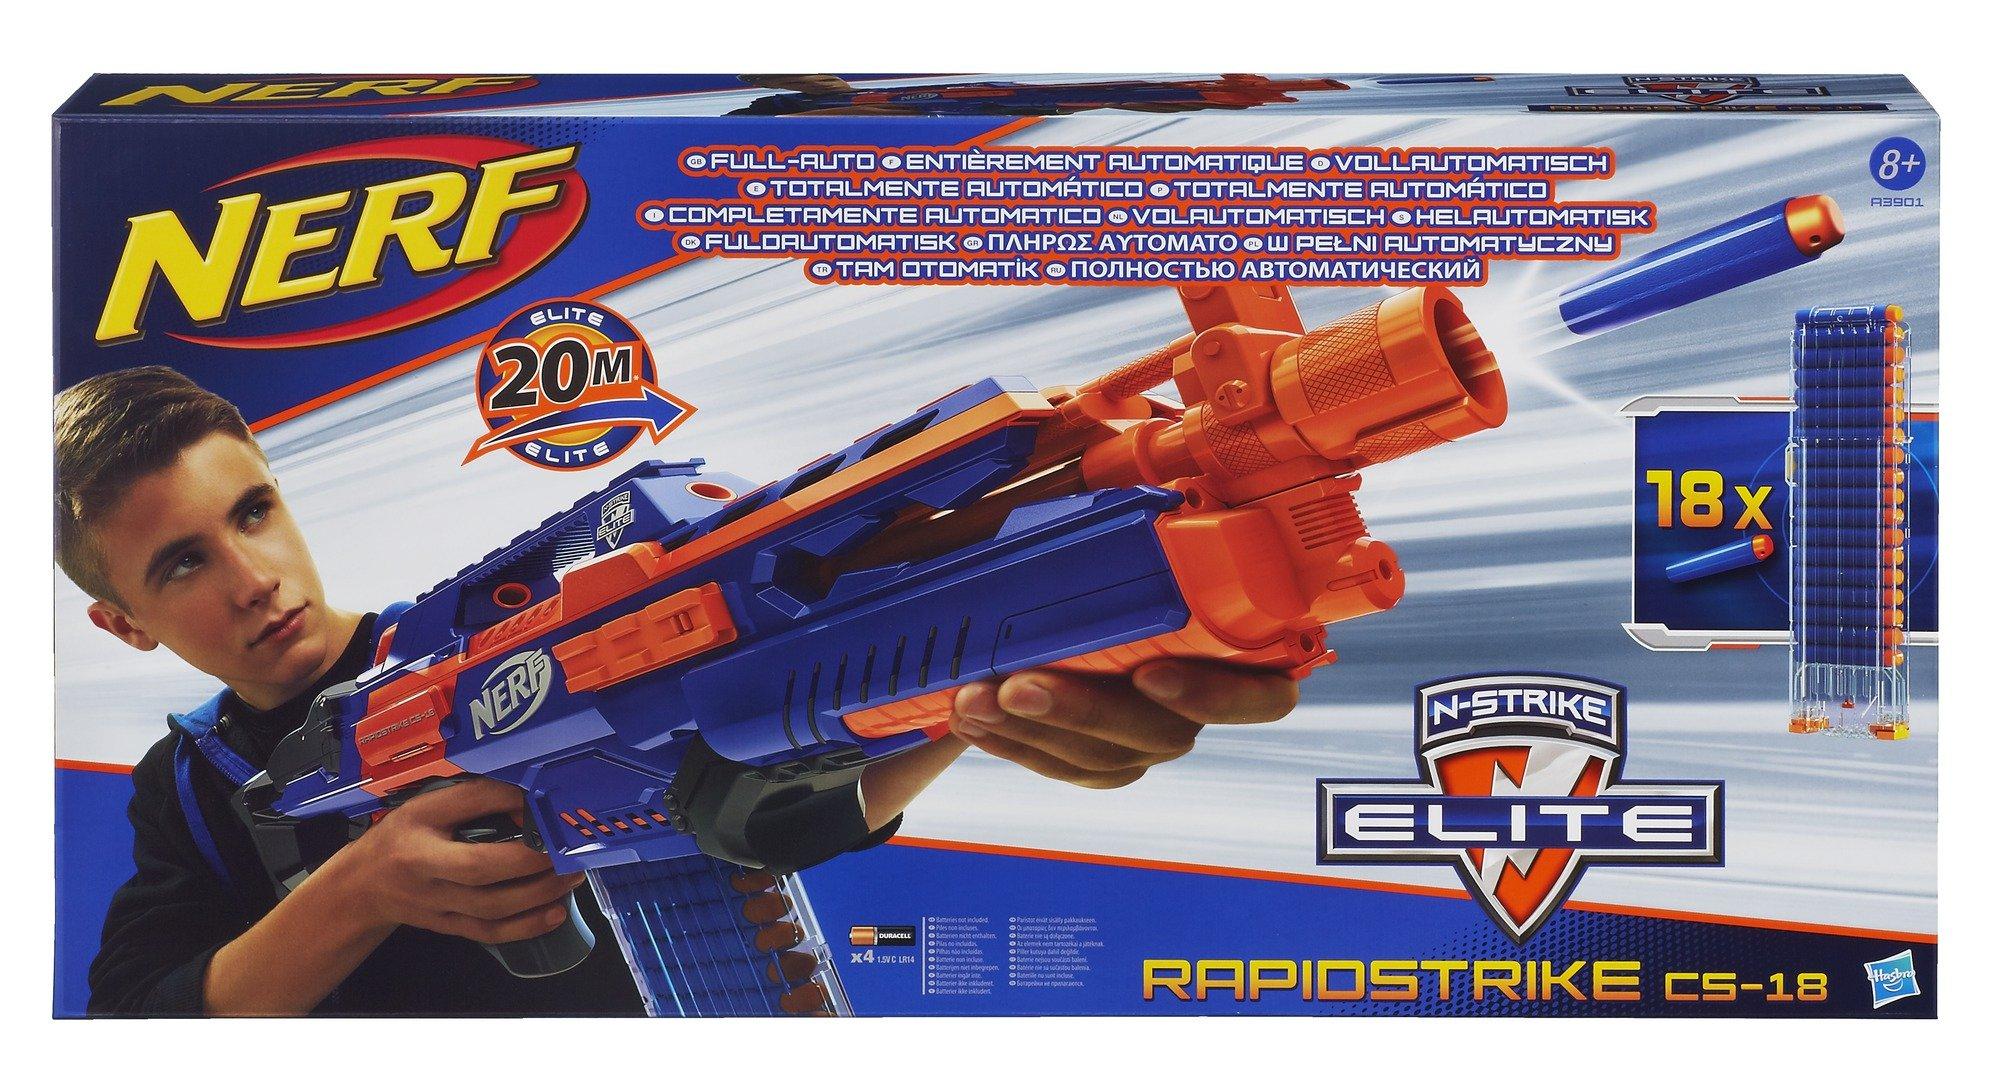 Nerf - Arma de juguete modelo Elite Counterstrike 18 (Hasbro A3901E24) product image